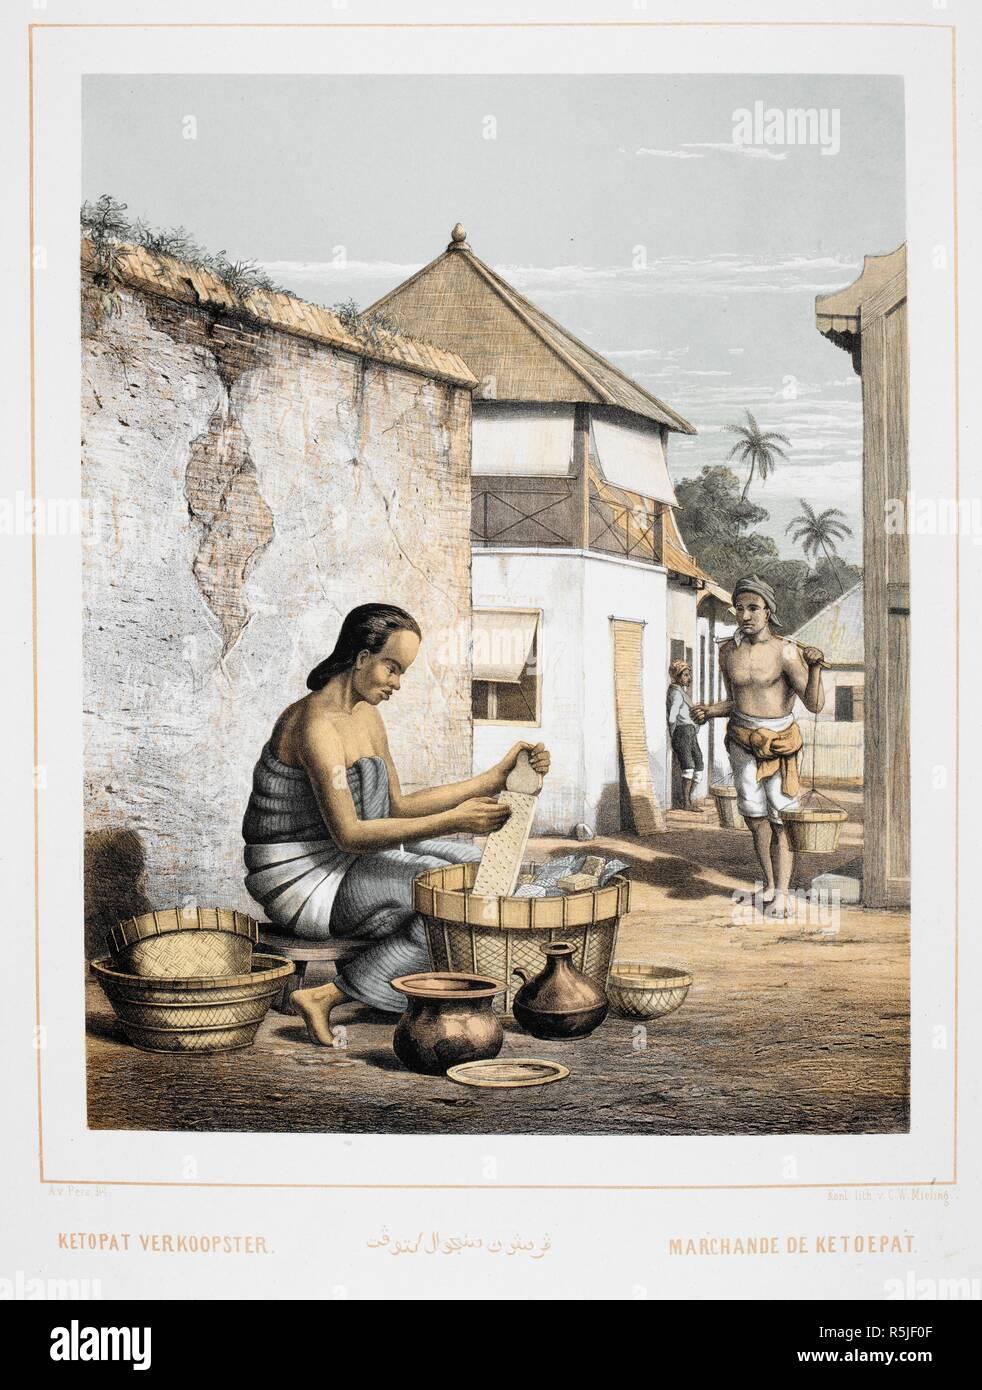 A seller of utensils. An inhabitant of Indonesia. Nederlandsch  Oost-Indischen Typen.